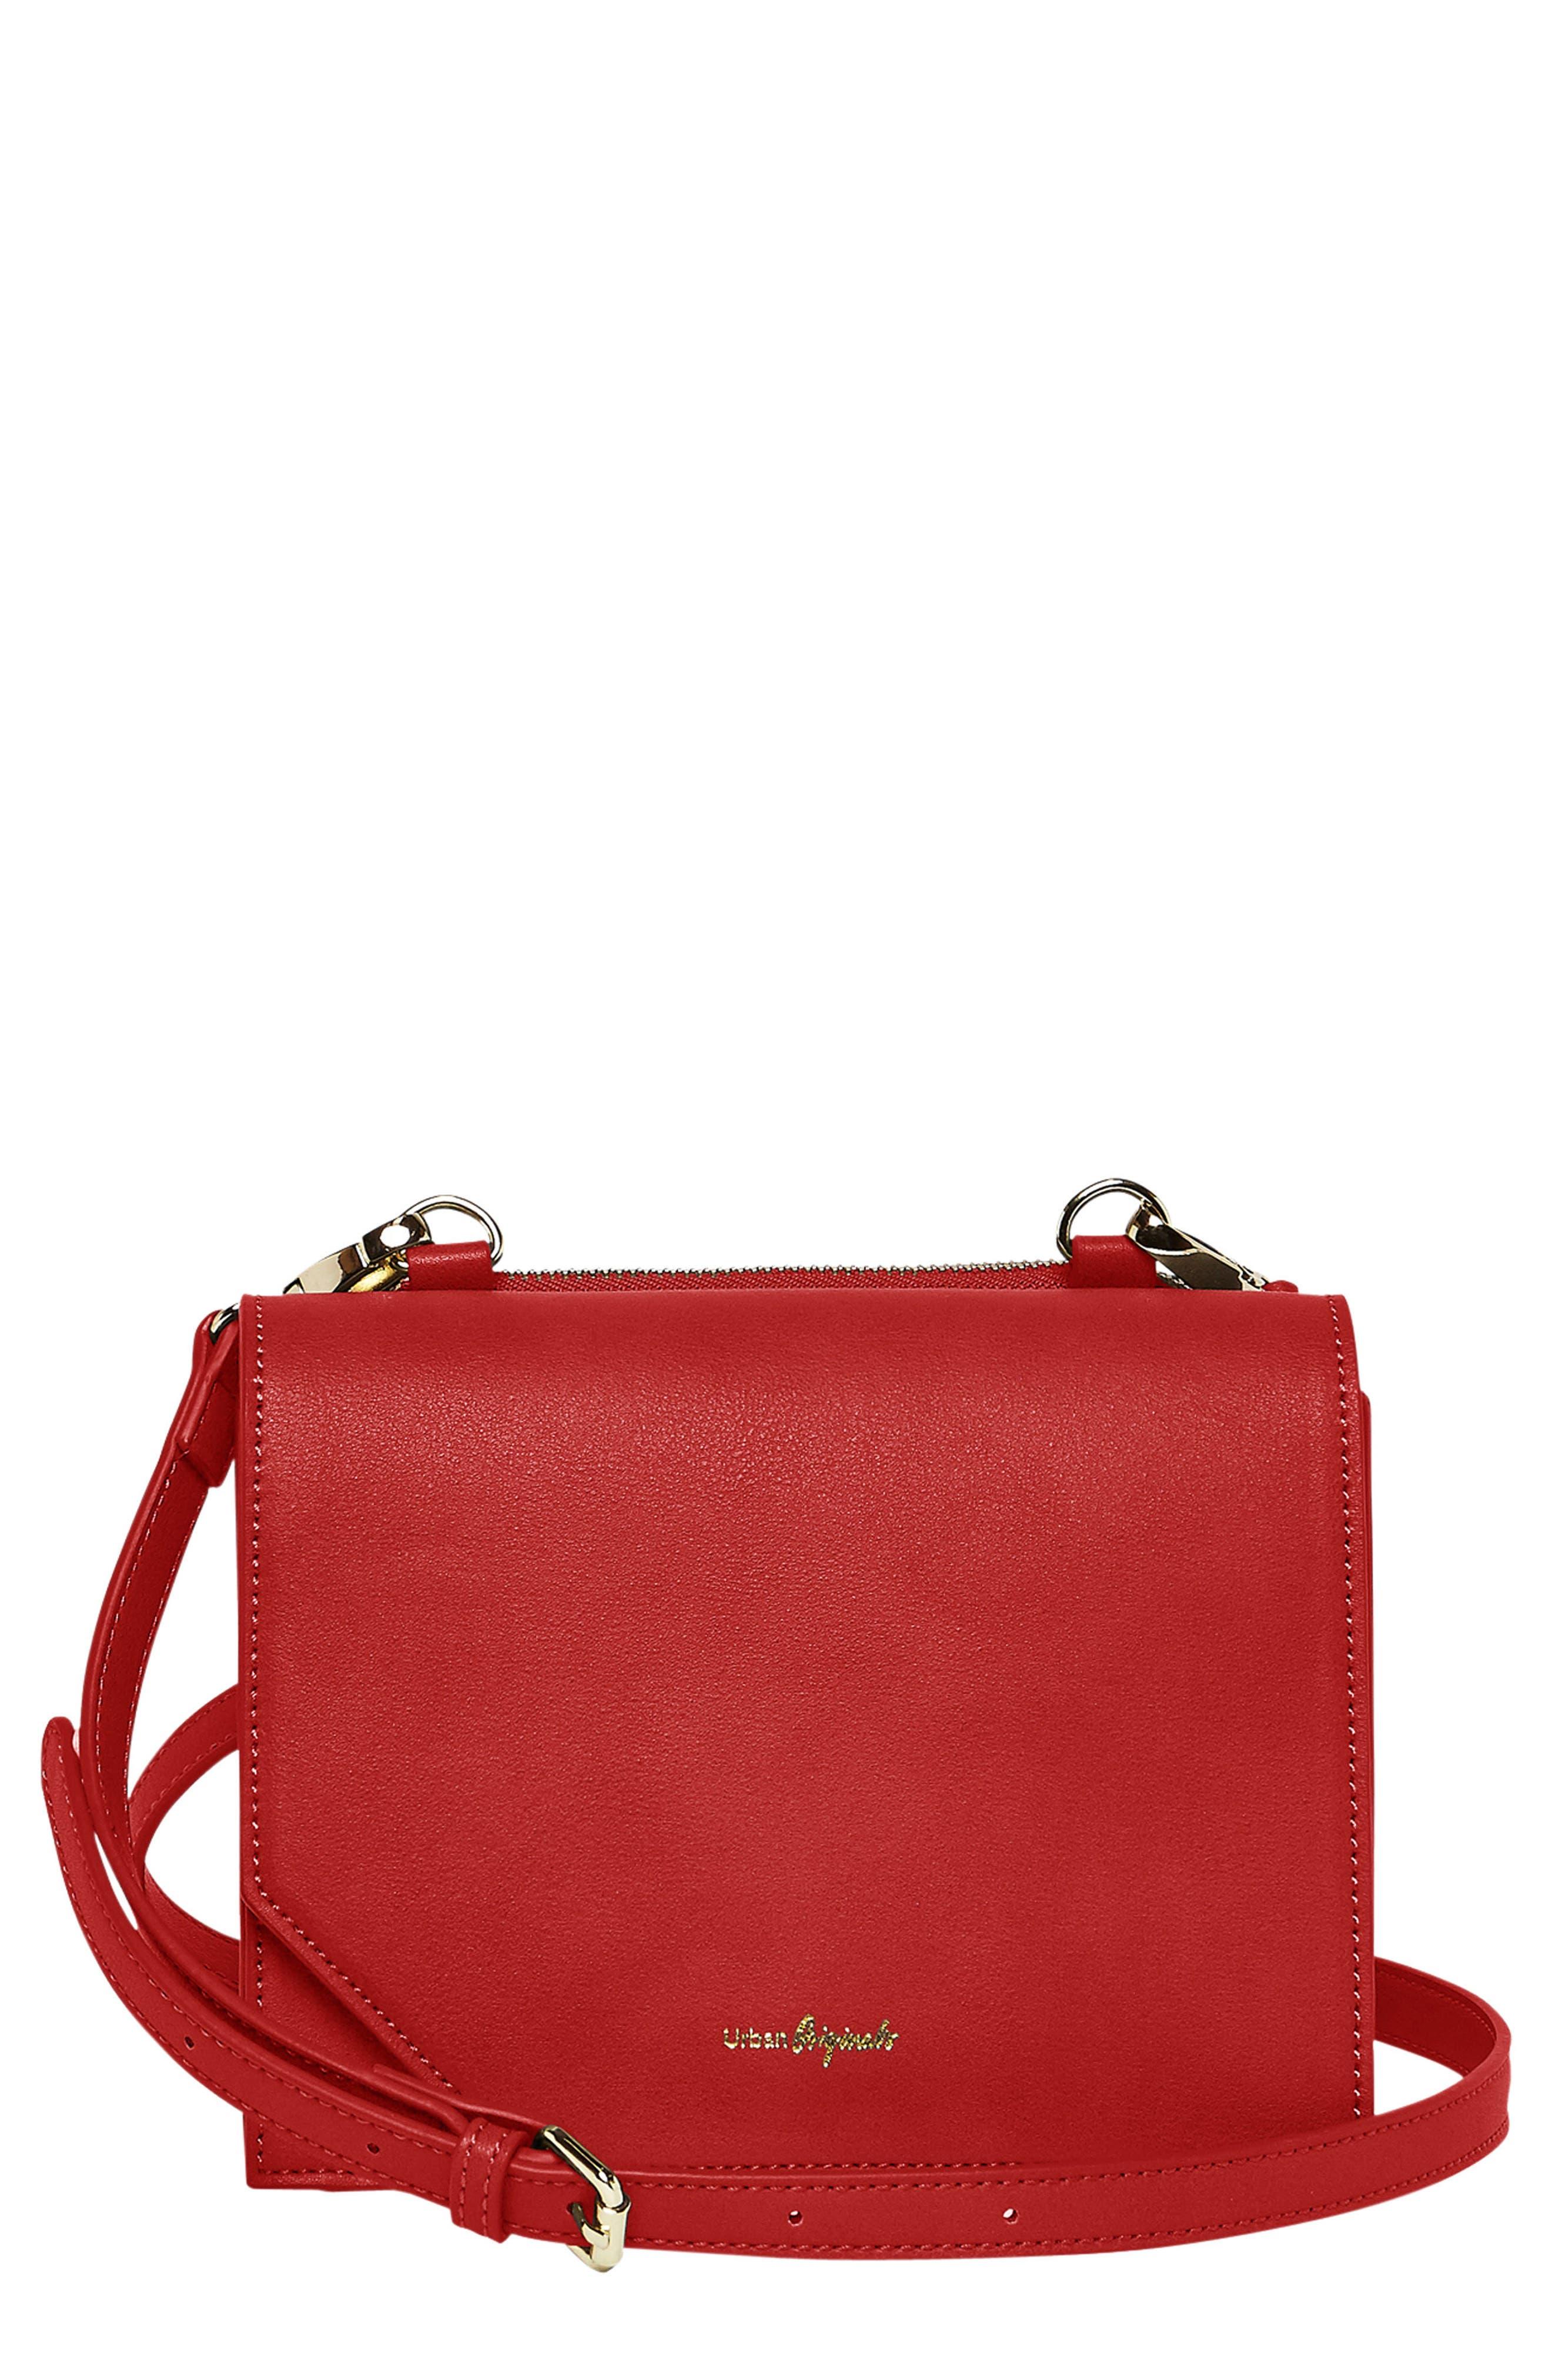 Shining Star Vegan Leather Crossbody Bag,                             Main thumbnail 4, color,